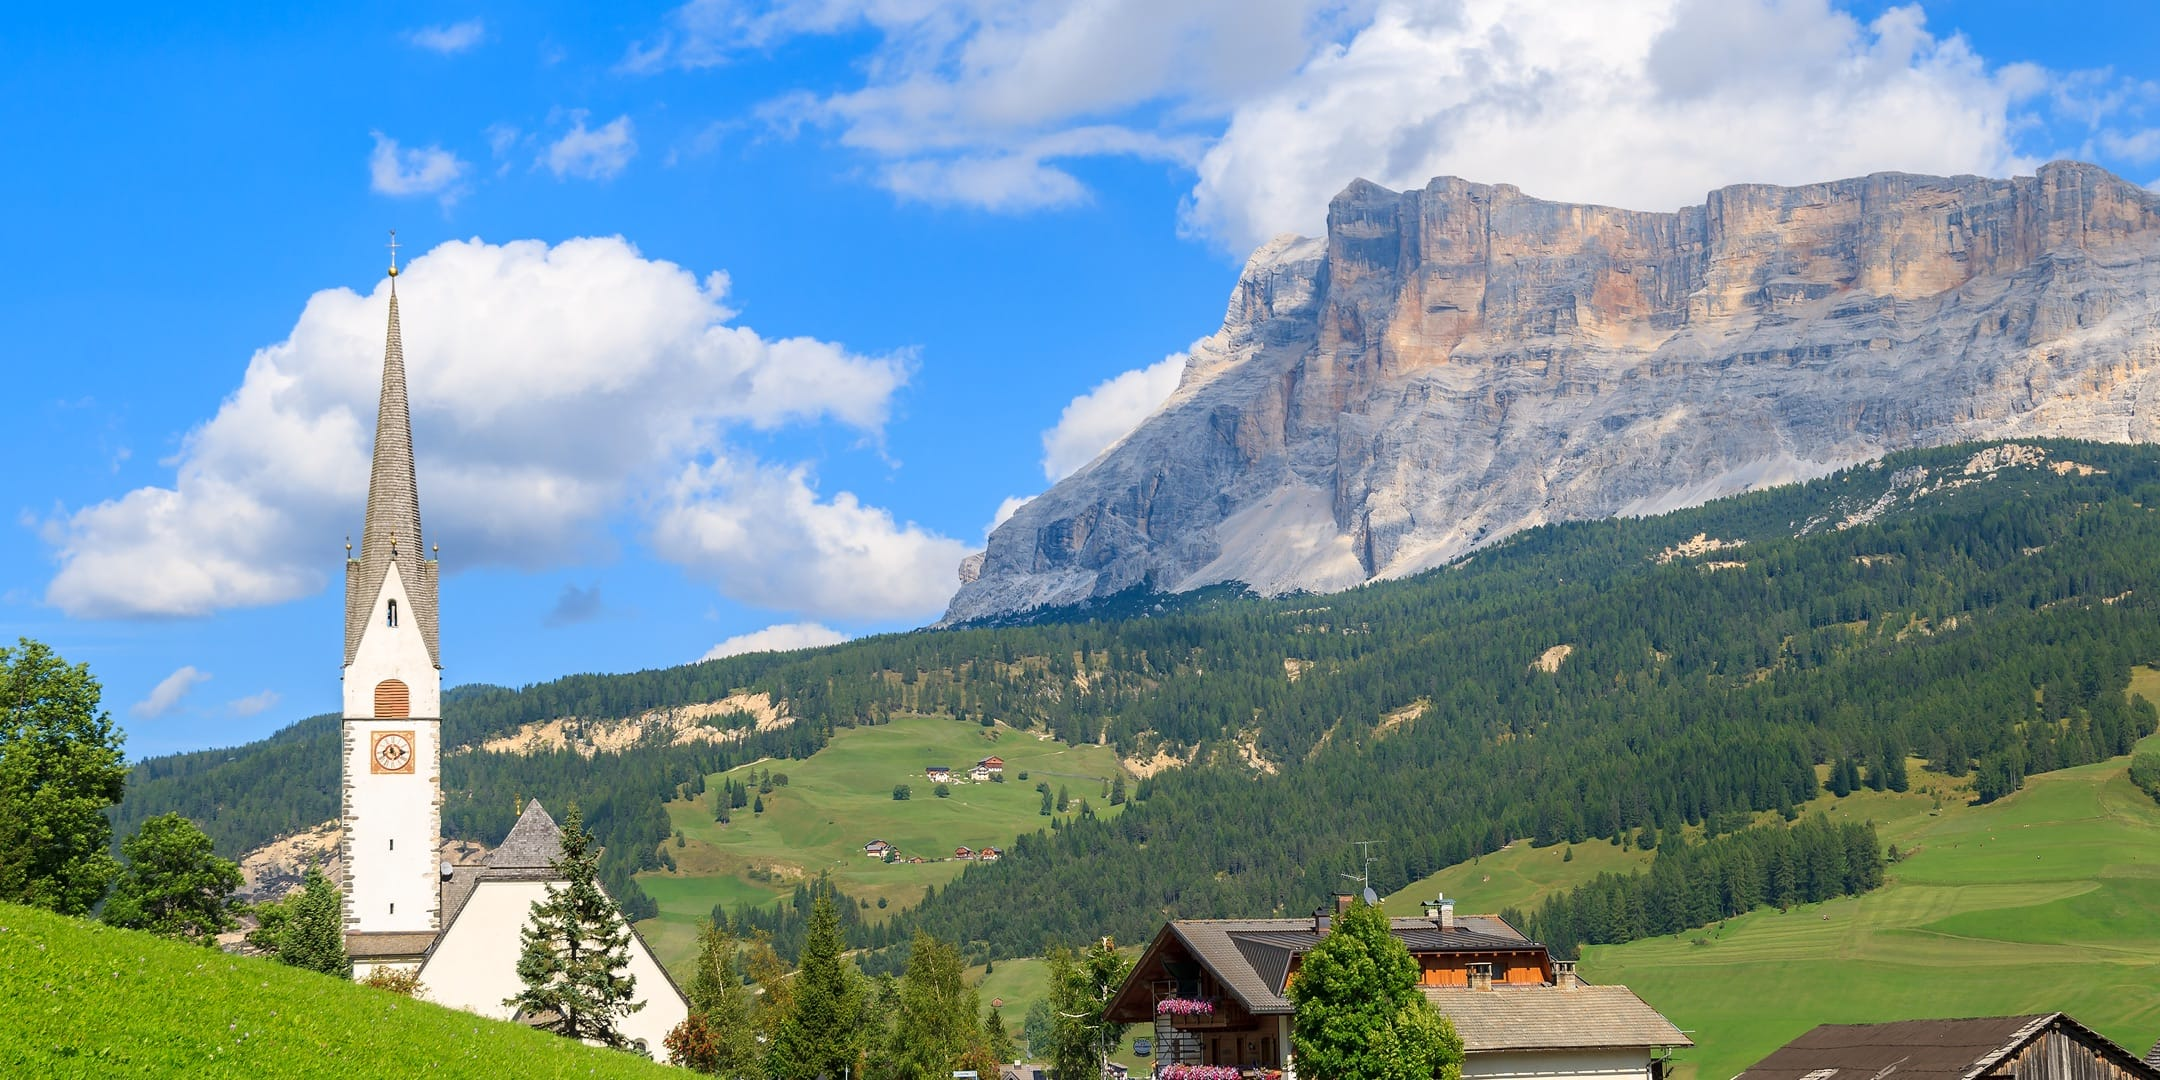 Residence a La Villa Alta Badia Dolomiti - Les Contrades